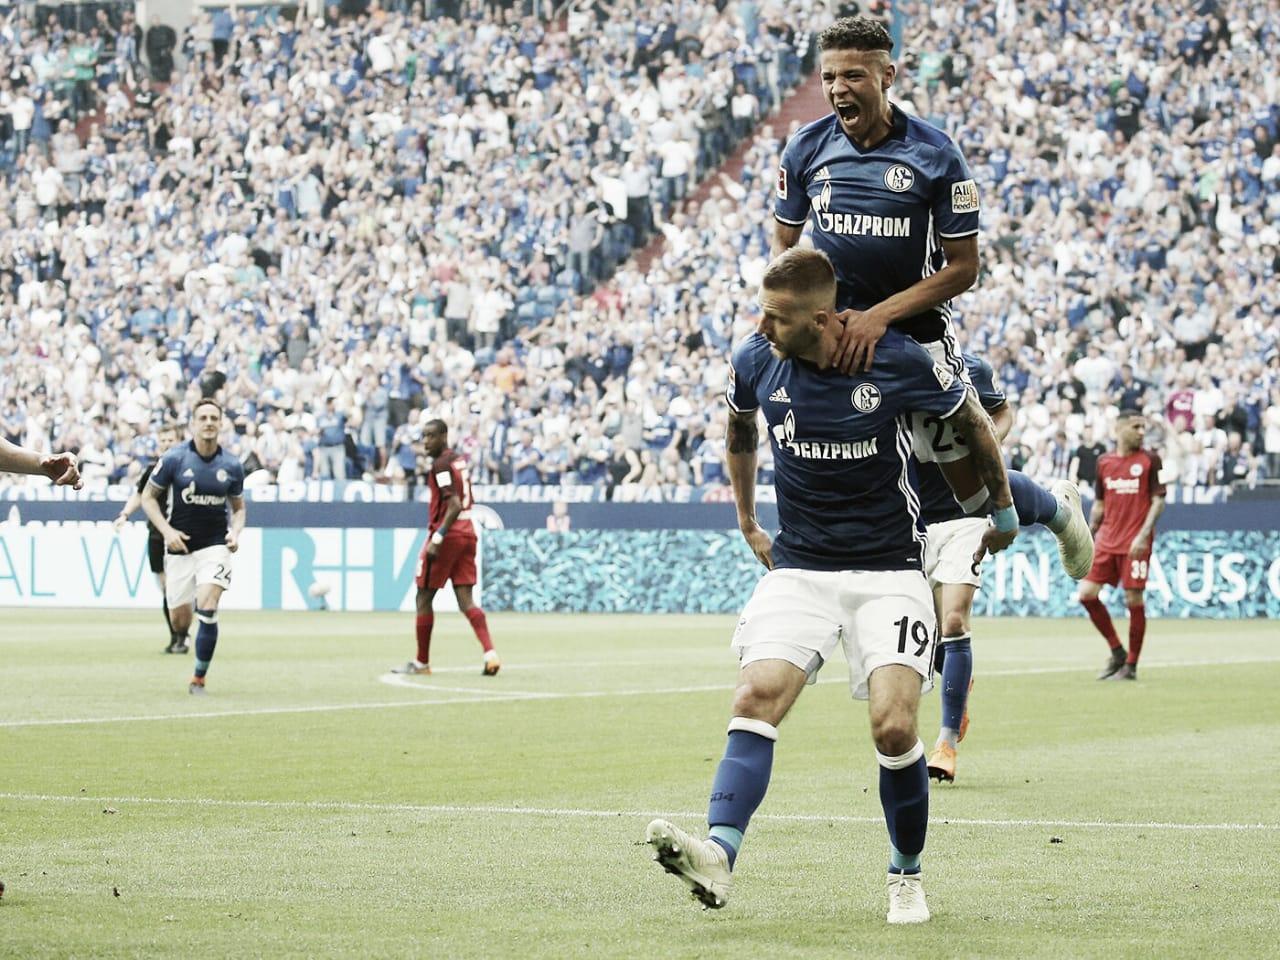 Resultado final Schalke 04 x Eintracht Frankfurt pela Bundesliga (1-2)